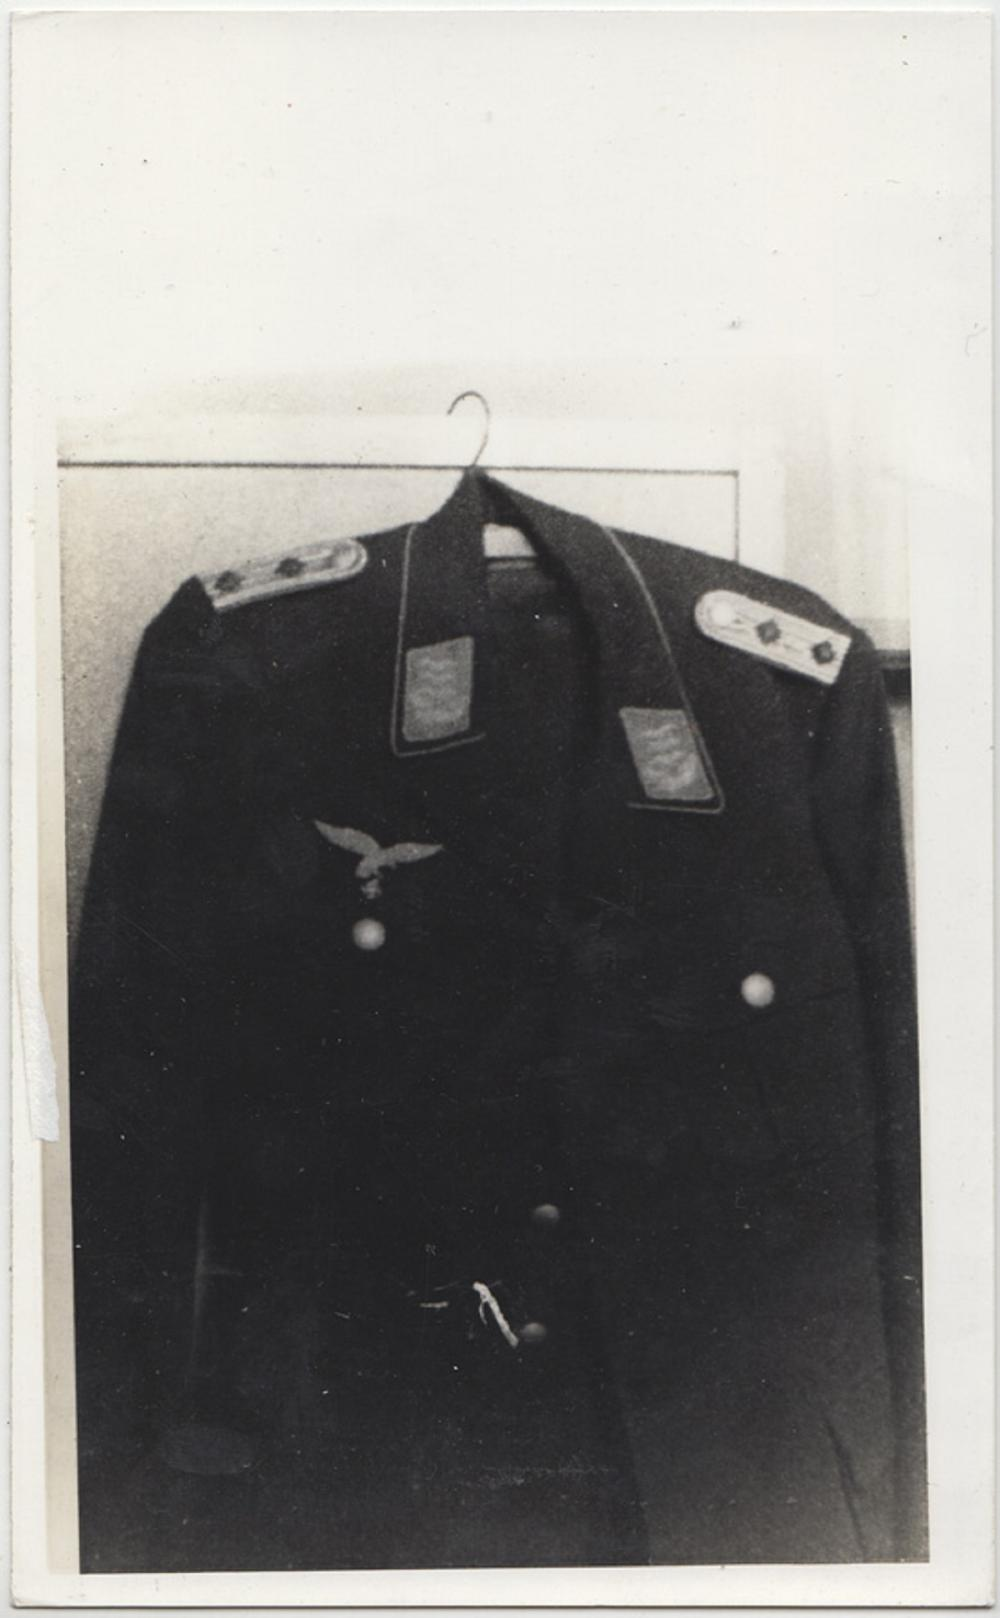 WWII Germany. 'Rudolf Hess' and 'Albert Speer' Original Mug Shots